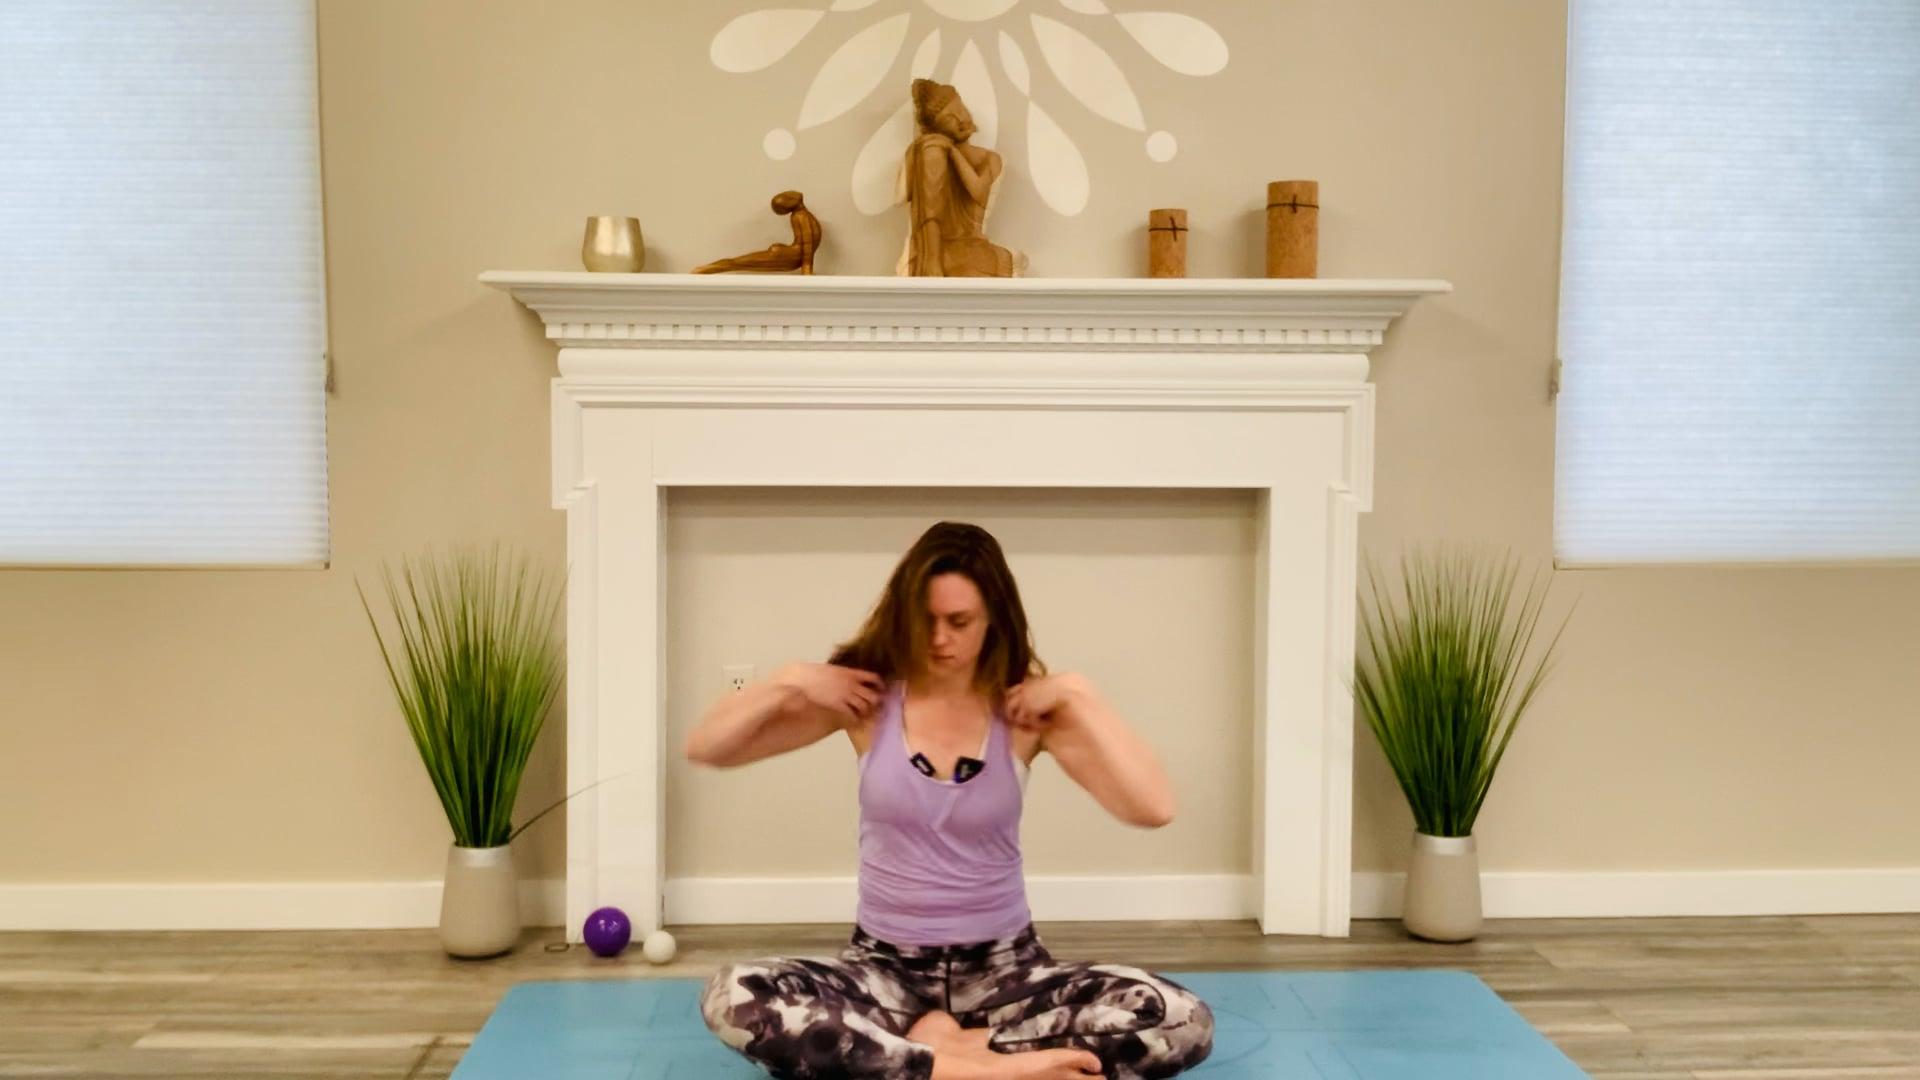 Nadi Method Shoulders & Neck 4-21-21 - 30 Minutes.mov